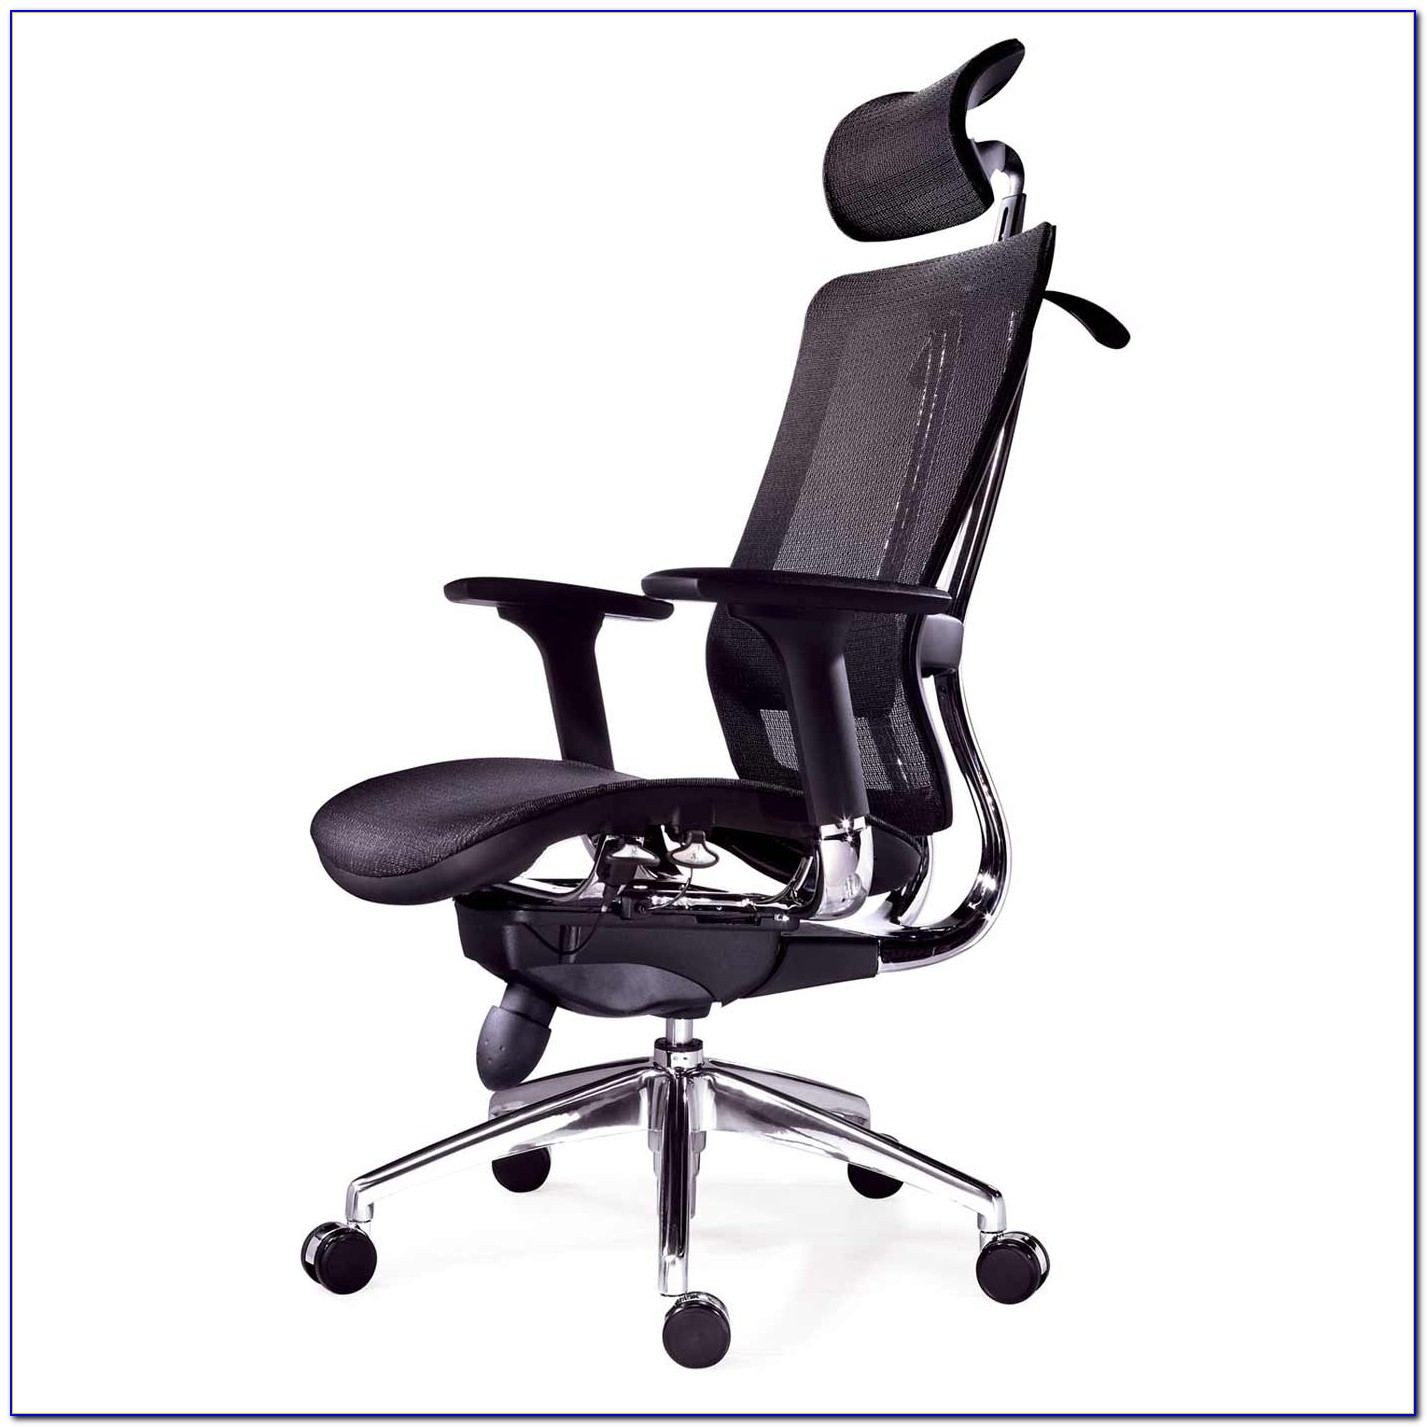 Ergonomic Office Chair Staples